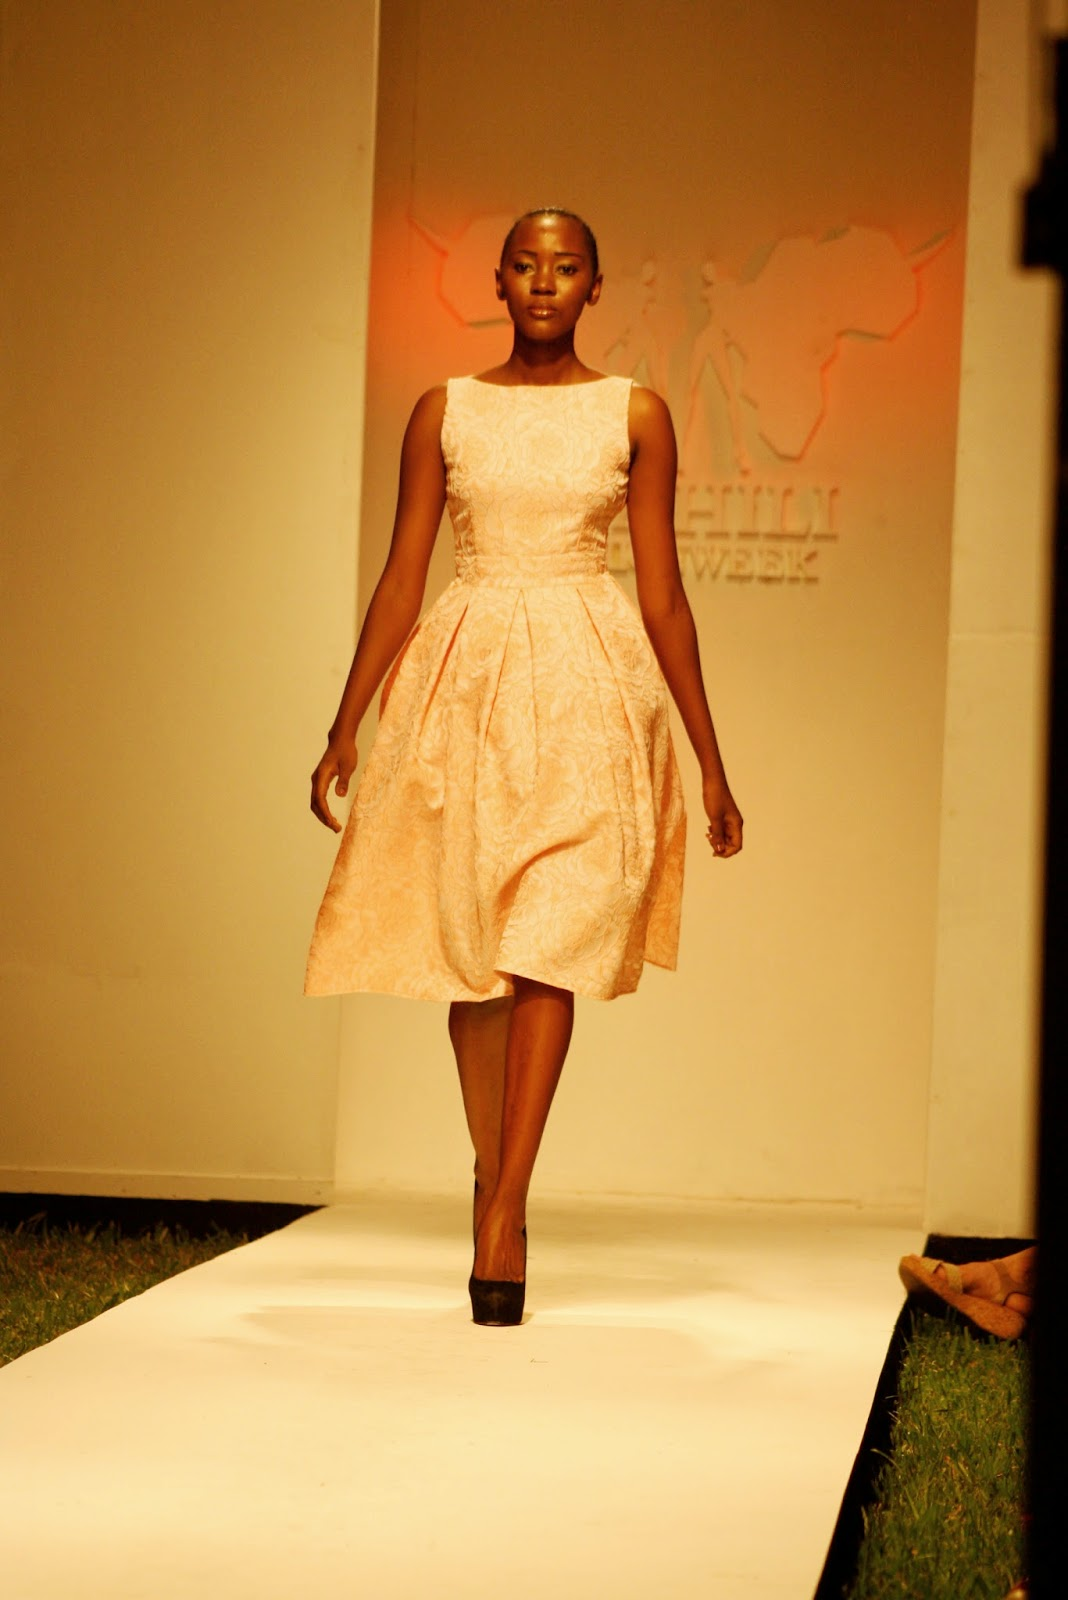 S s fashion terrell tx 95